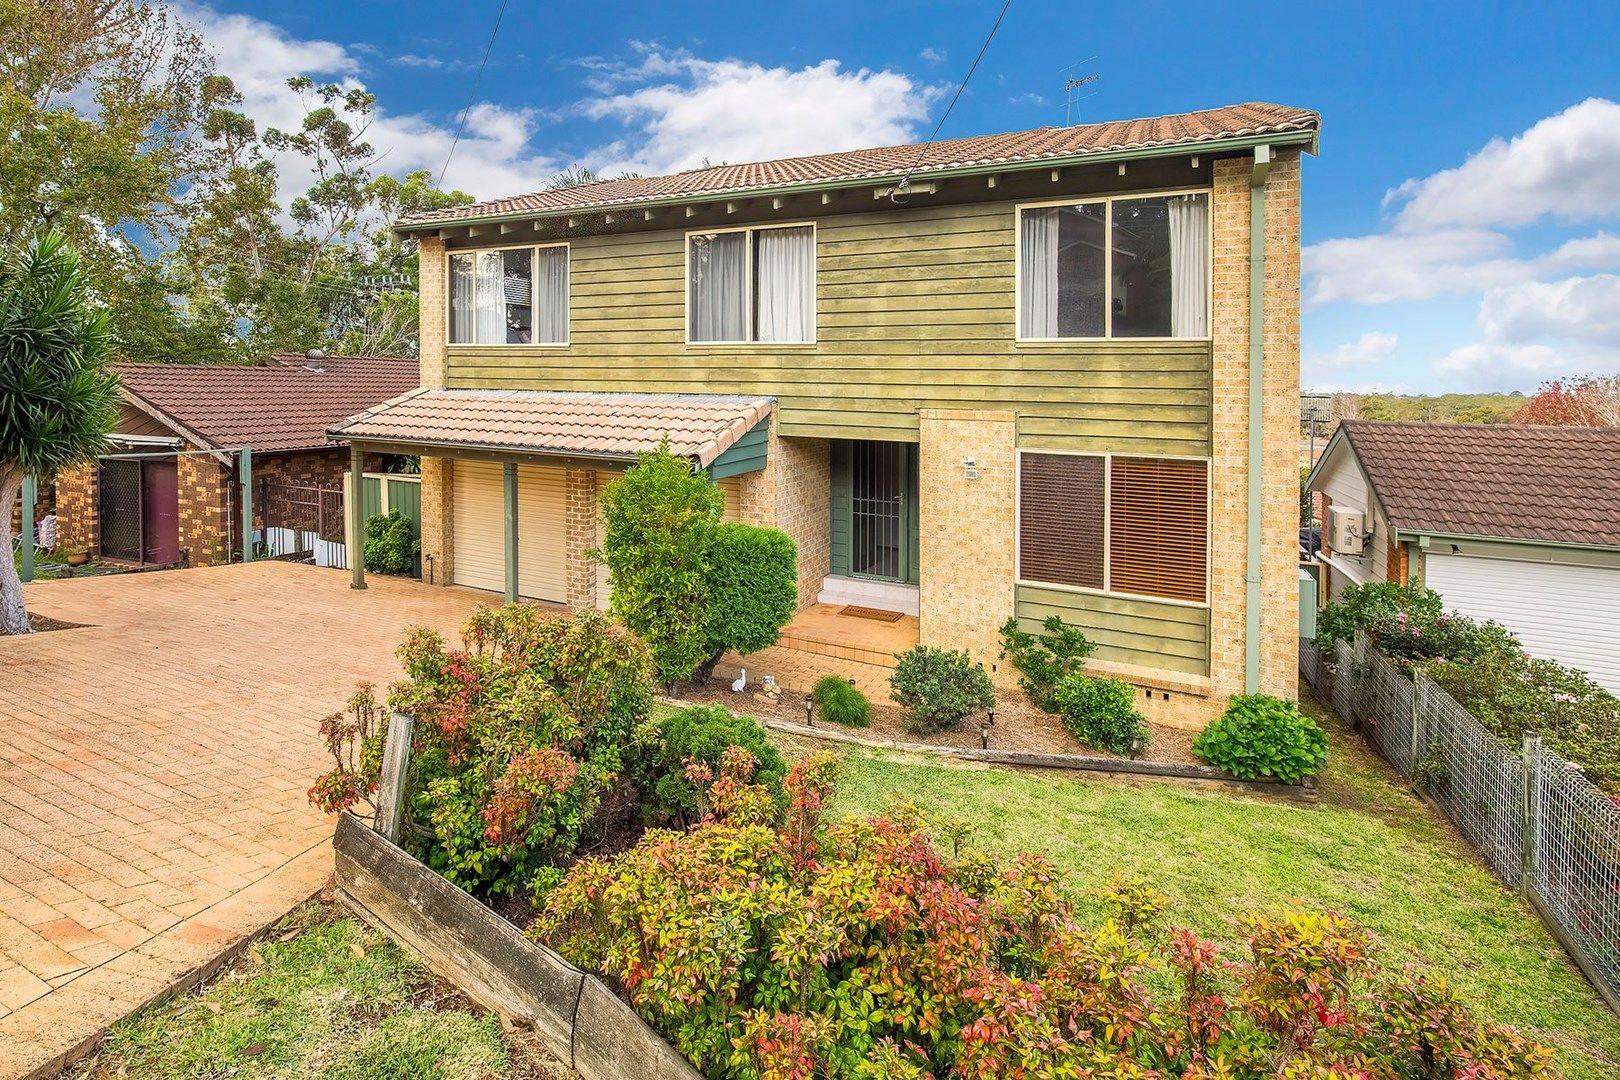 15 Hillside Drive, Berkeley Vale NSW 2261, Image 0